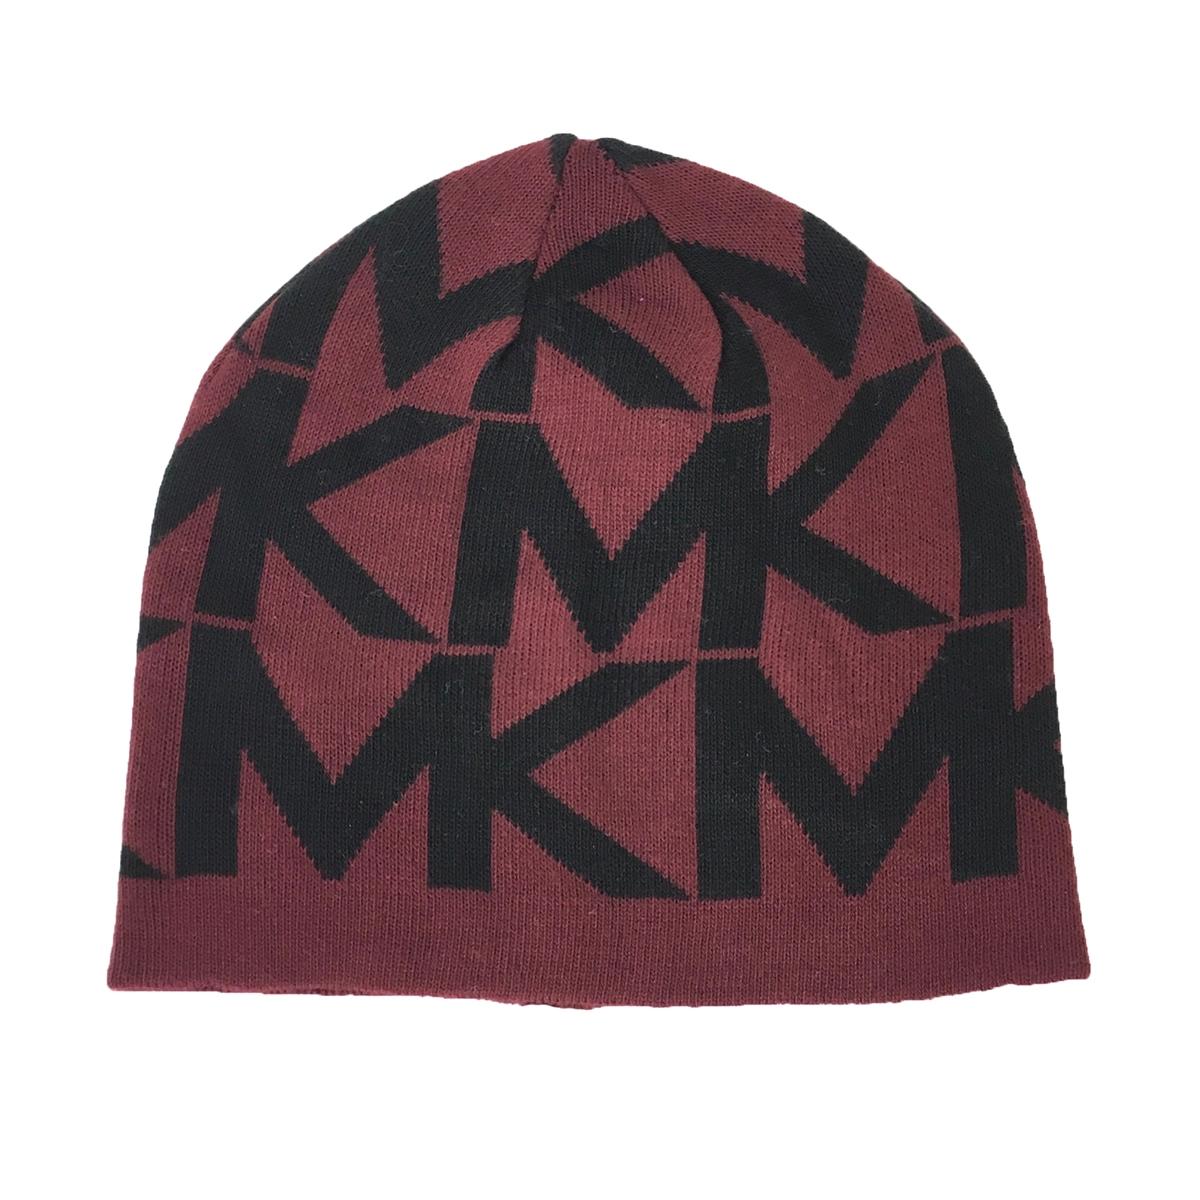 51f4d7cbfcd5f Michael Kors Logo Knit Nike NSW Beanie Tech Hat Adult Unisex ...